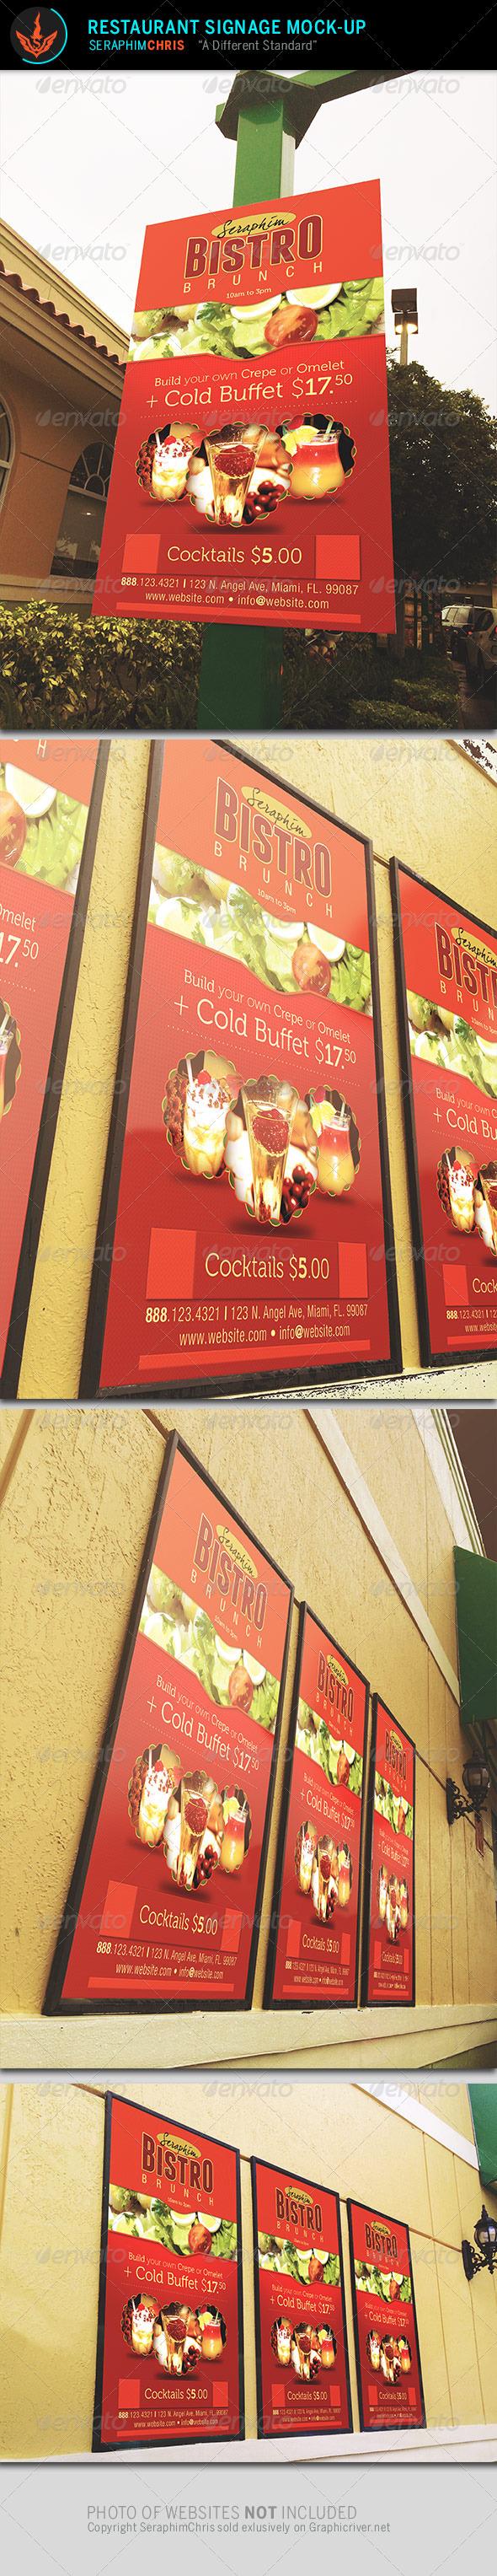 GraphicRiver Restaurant Signage Mock Up Template 8320041